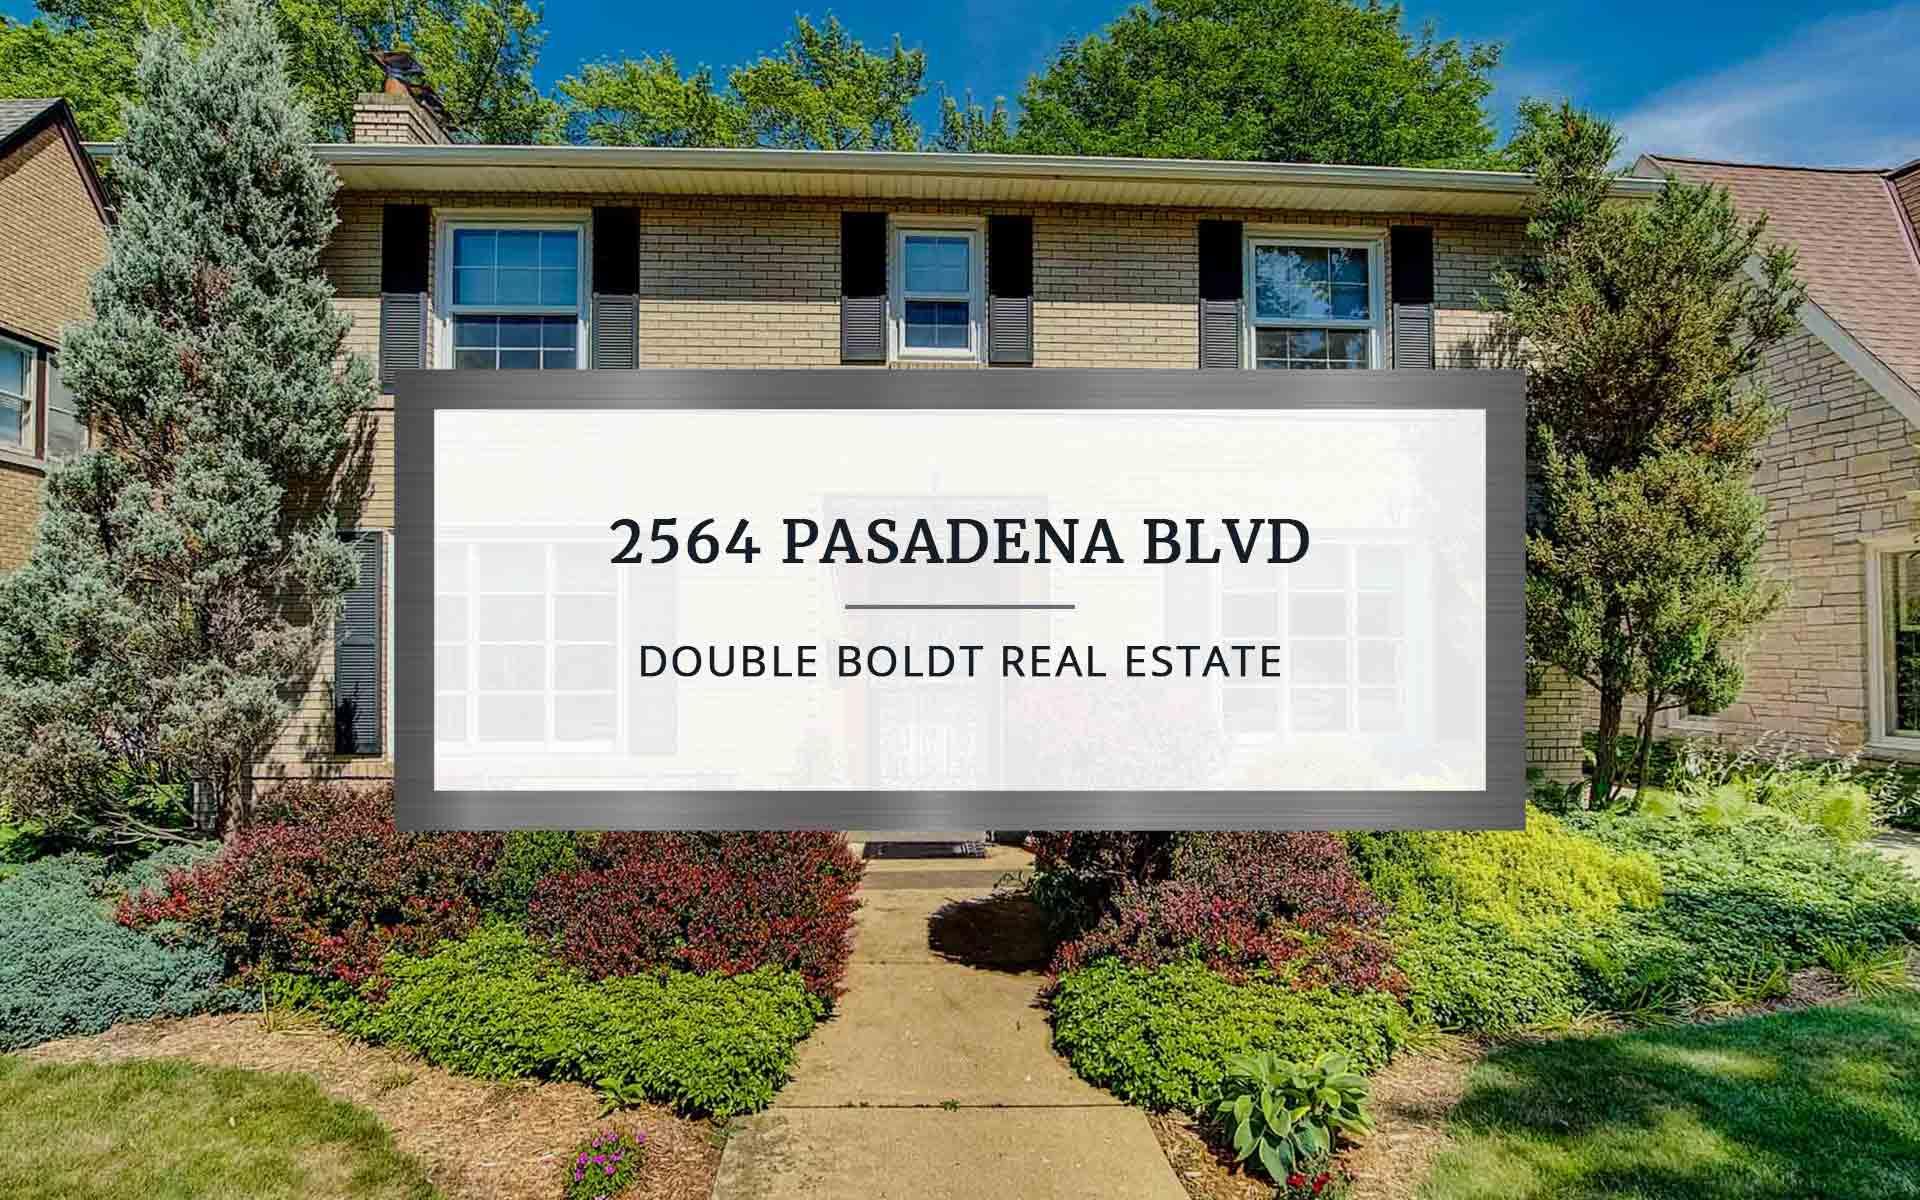 2564 Pasadena Blvd | Double Boldt Real Estate